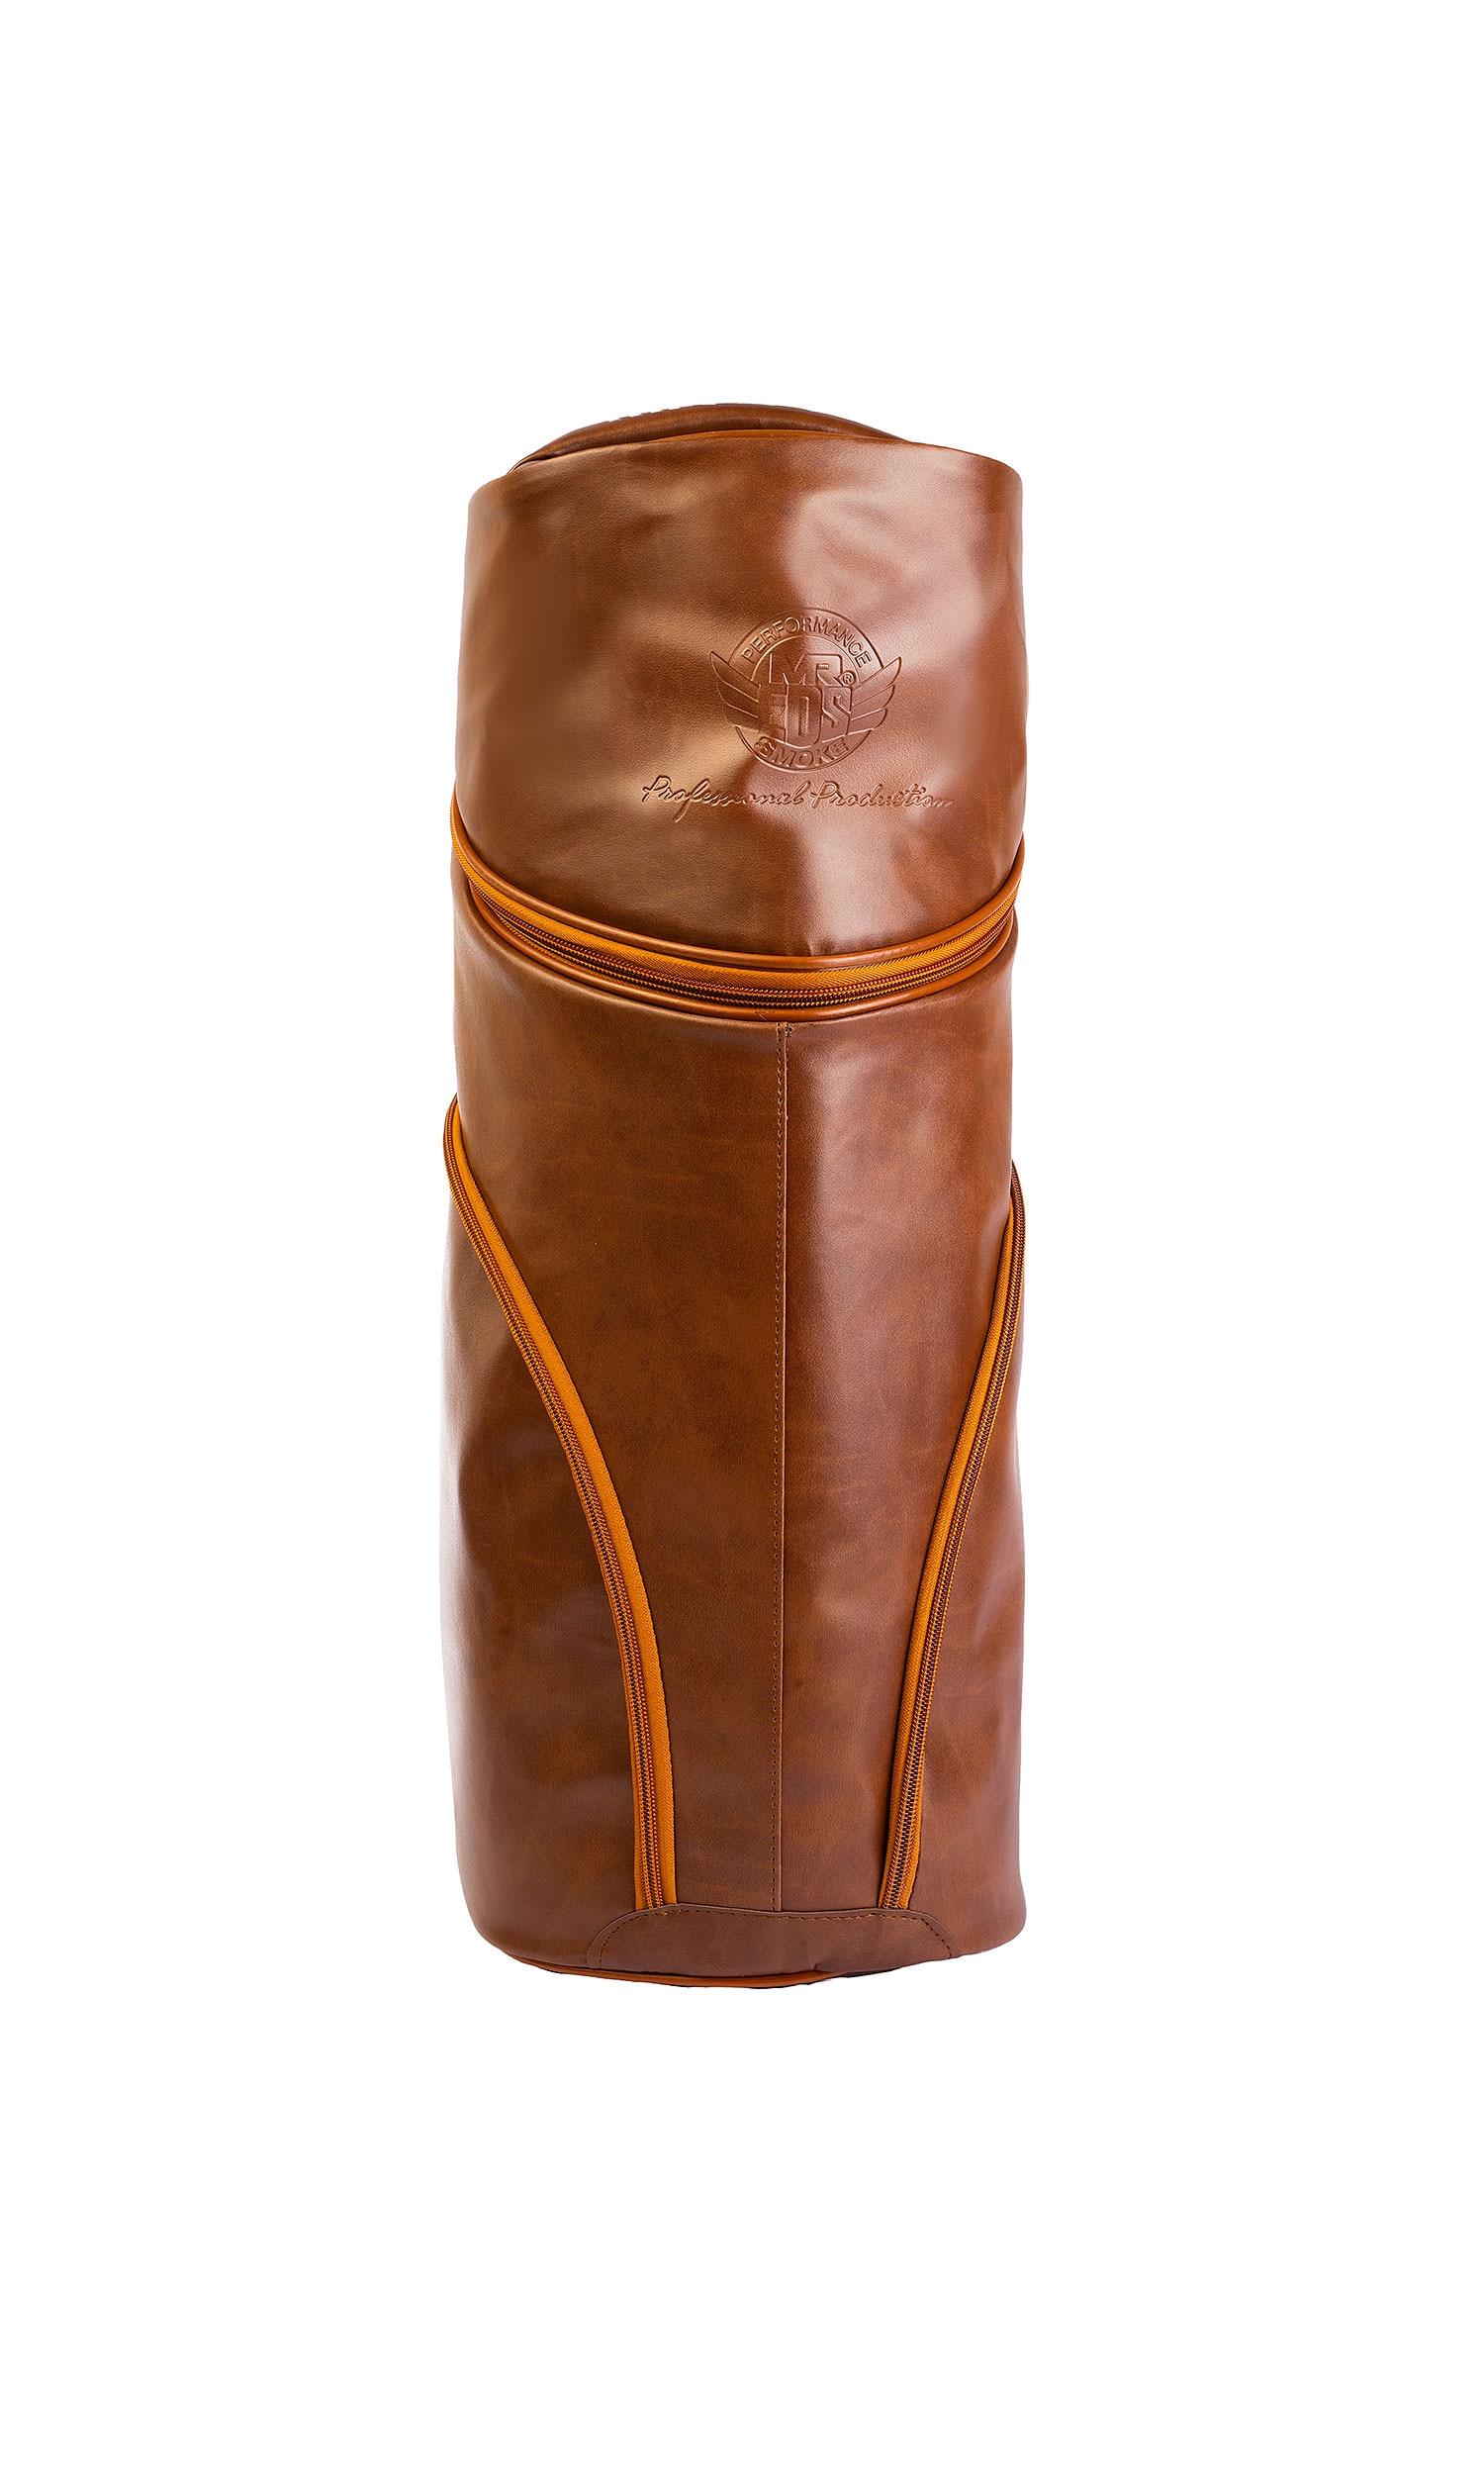 Babba Wood Epoxy Leather Hookah Bag Size L. Shisha Starbuzz Smoke enlarge